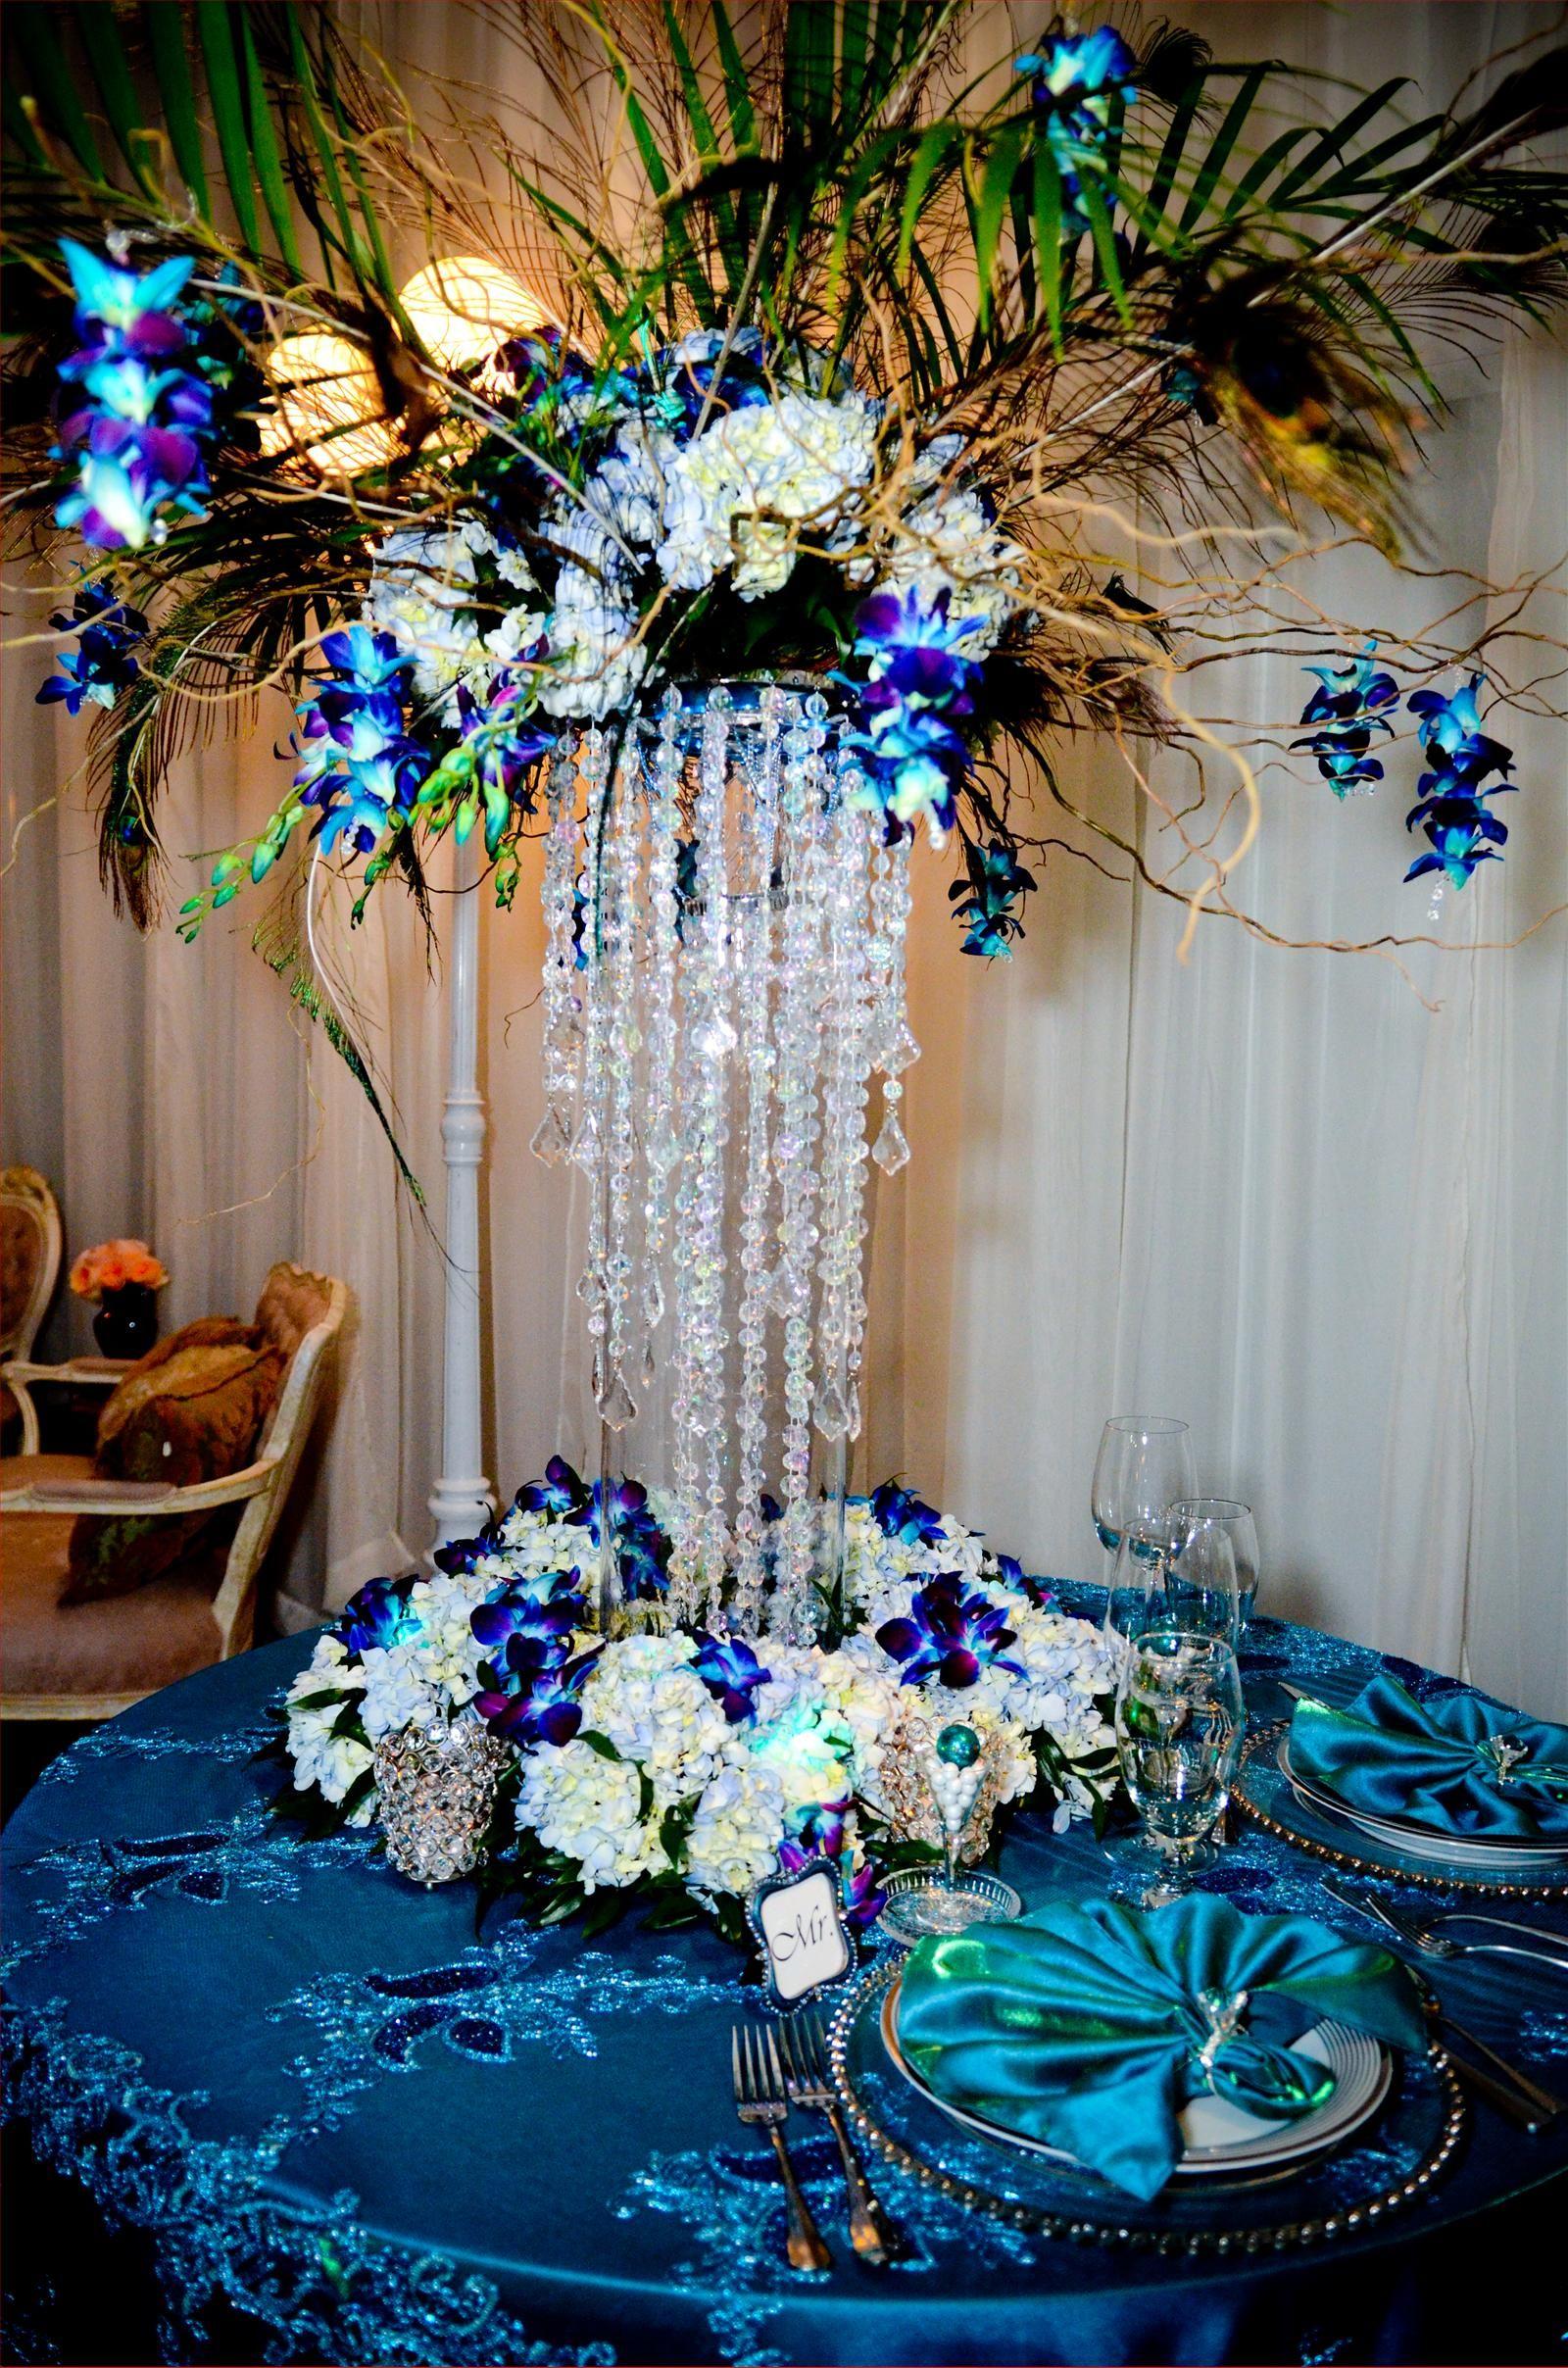 Extravagant peacock tropical wedding centerpiece - Peacock arrangements weddings ...